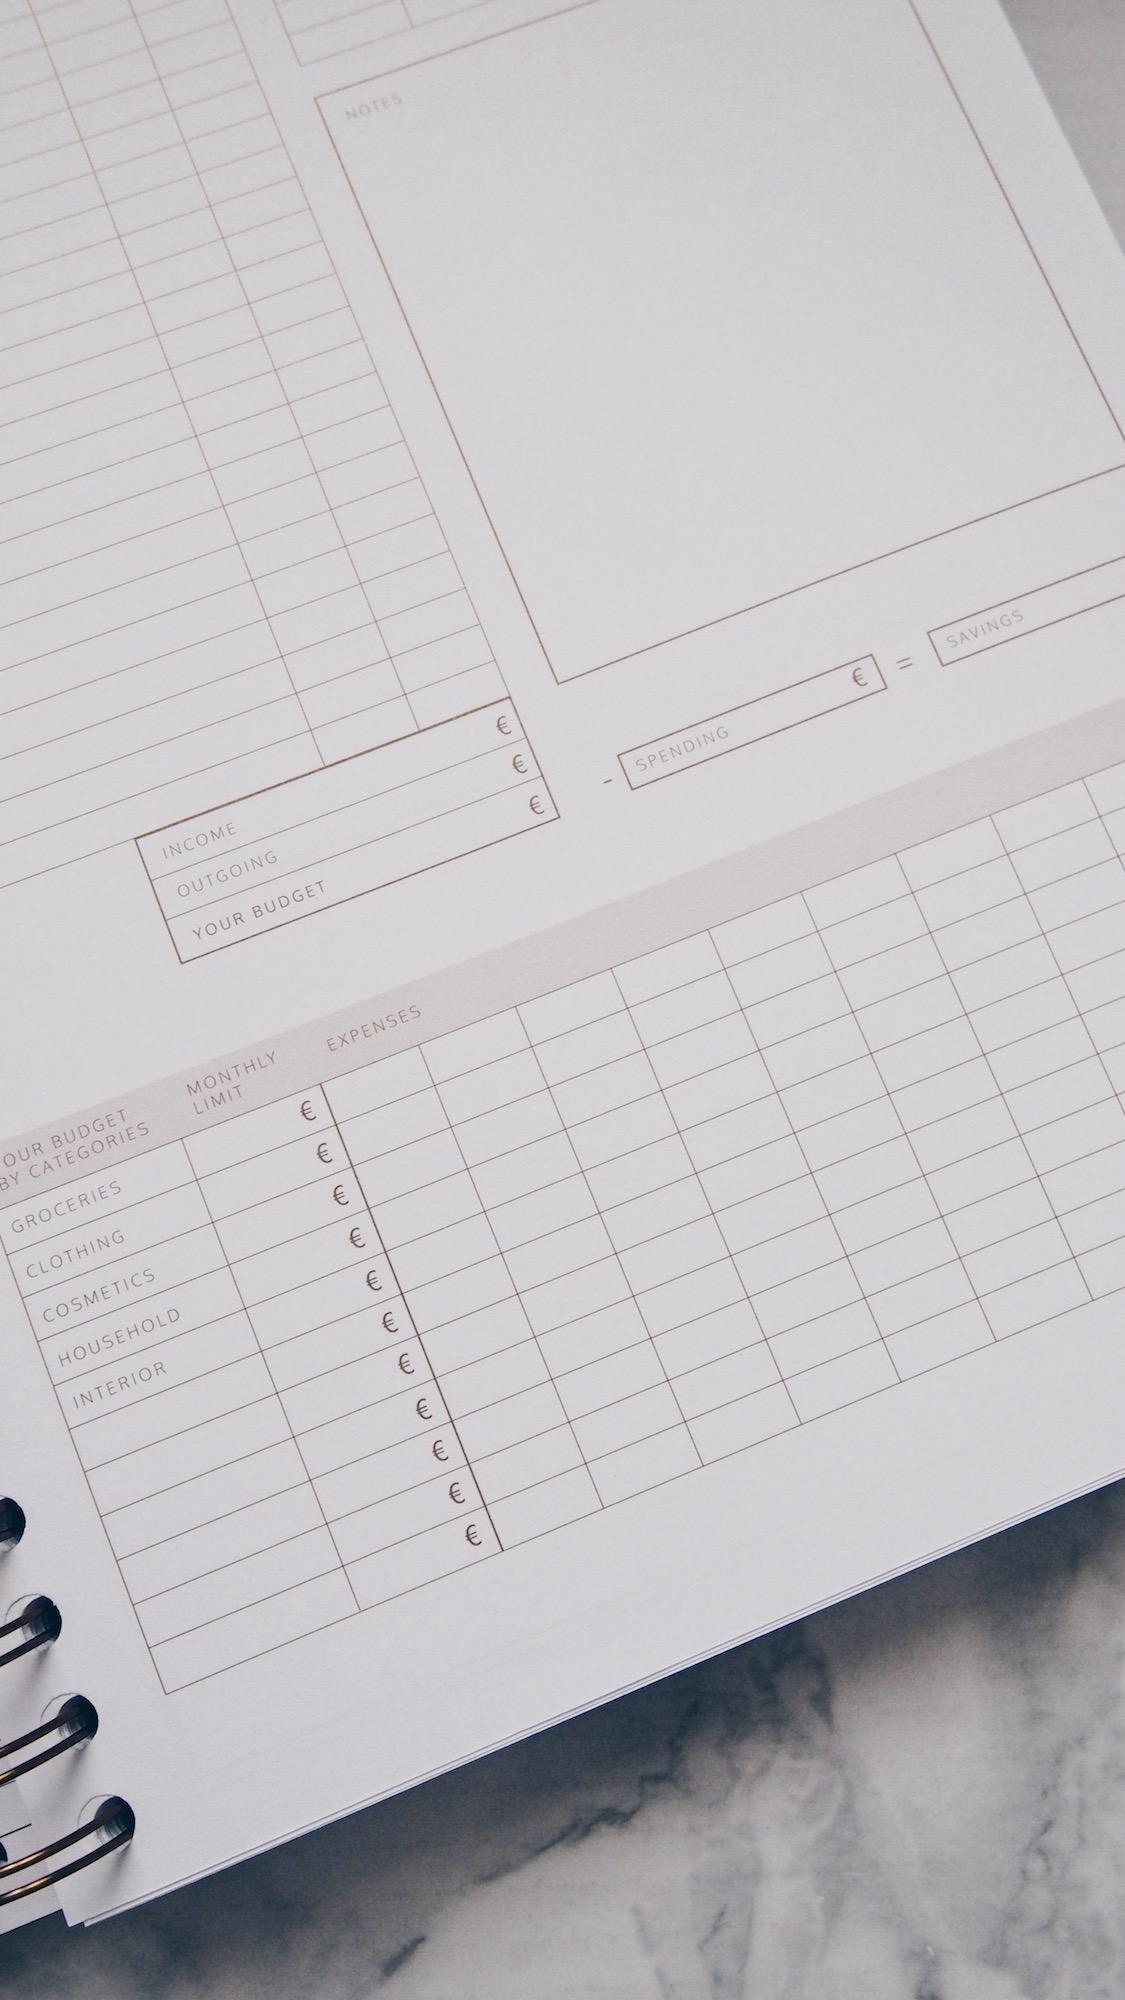 jo-and-judy-planner-organisateur-agenda